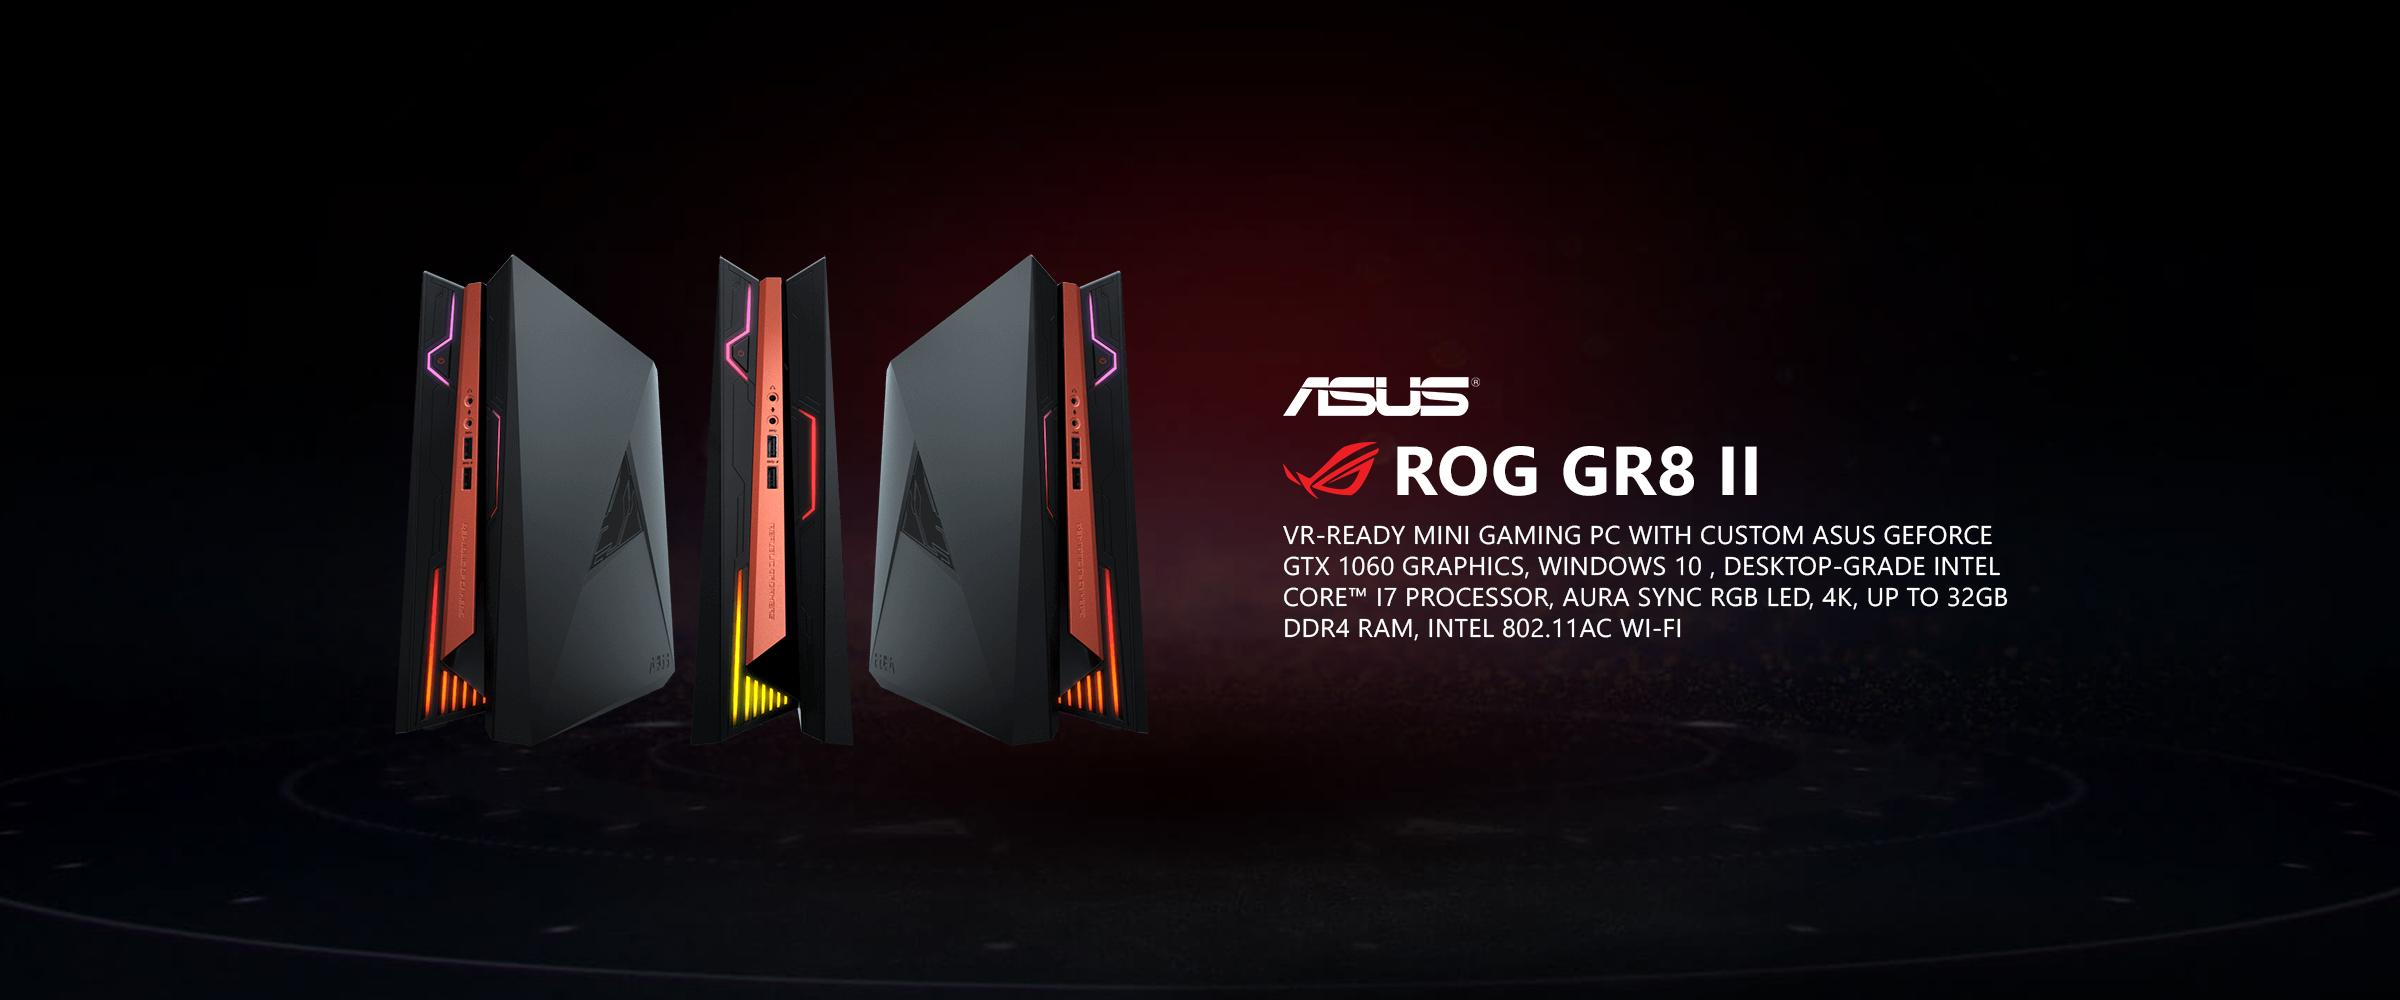 ASUS ROG GR8 II VR-Ready Mini Gaming PC